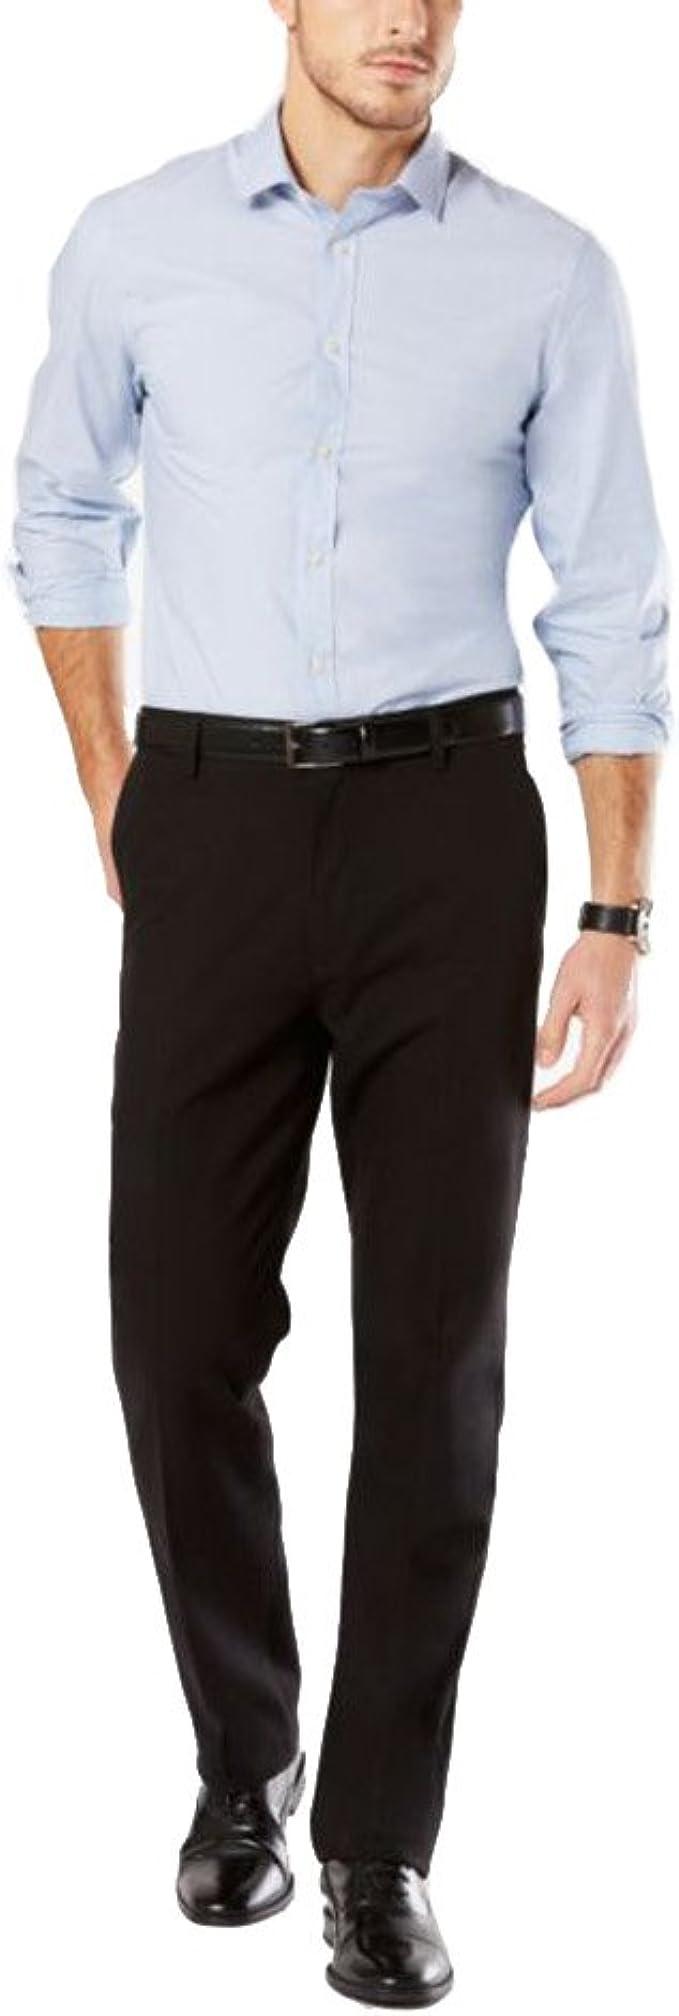 pantalones-negros-para-hombres-caballeros